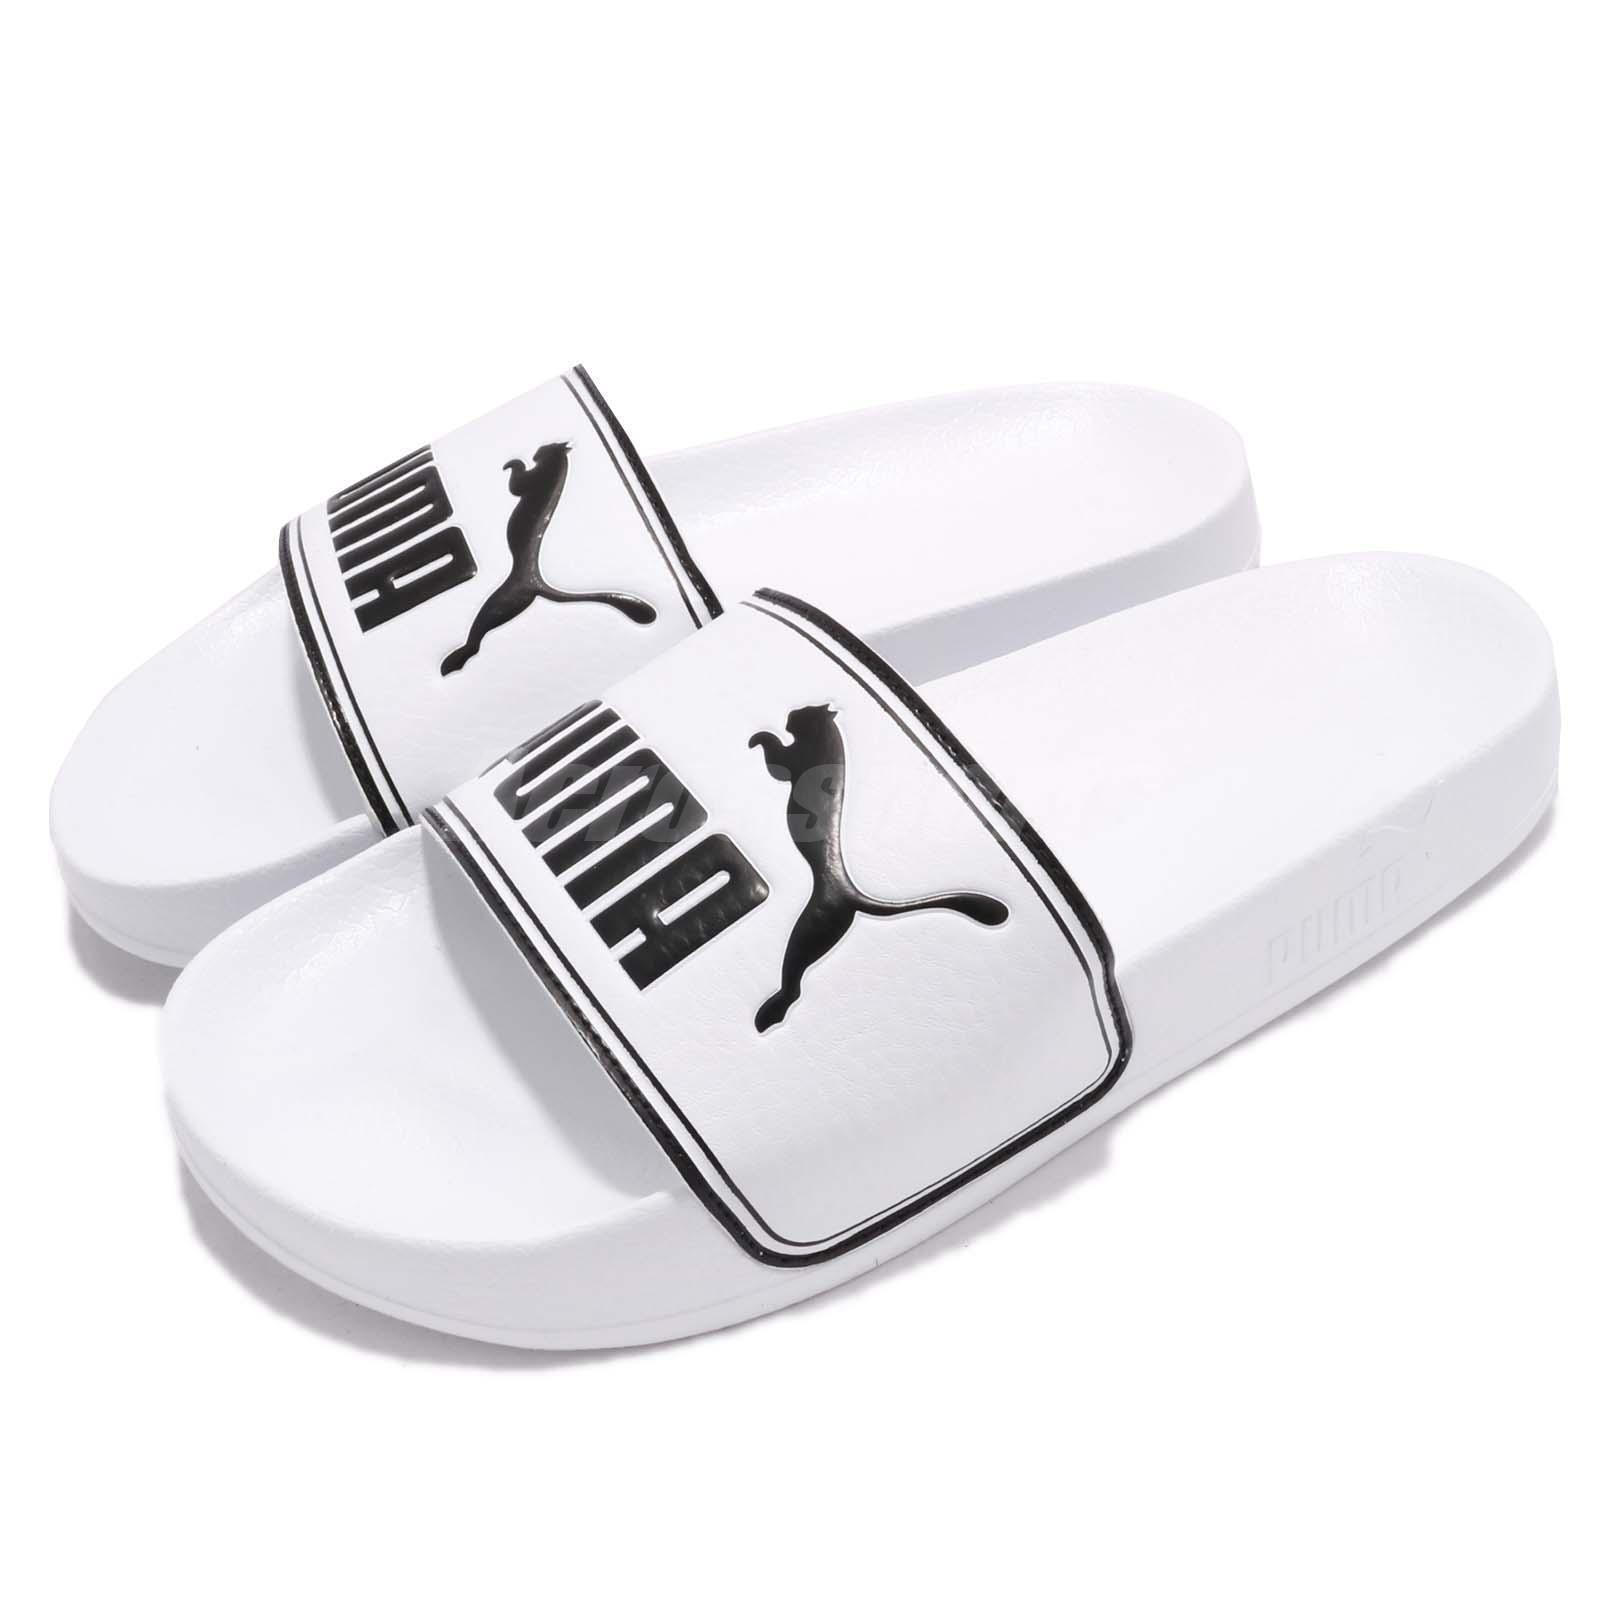 Puma Leadcat Sandal Big Logo Blanco Negro Hombre Sandal Leadcat Slippers Slides 36026308 982a95